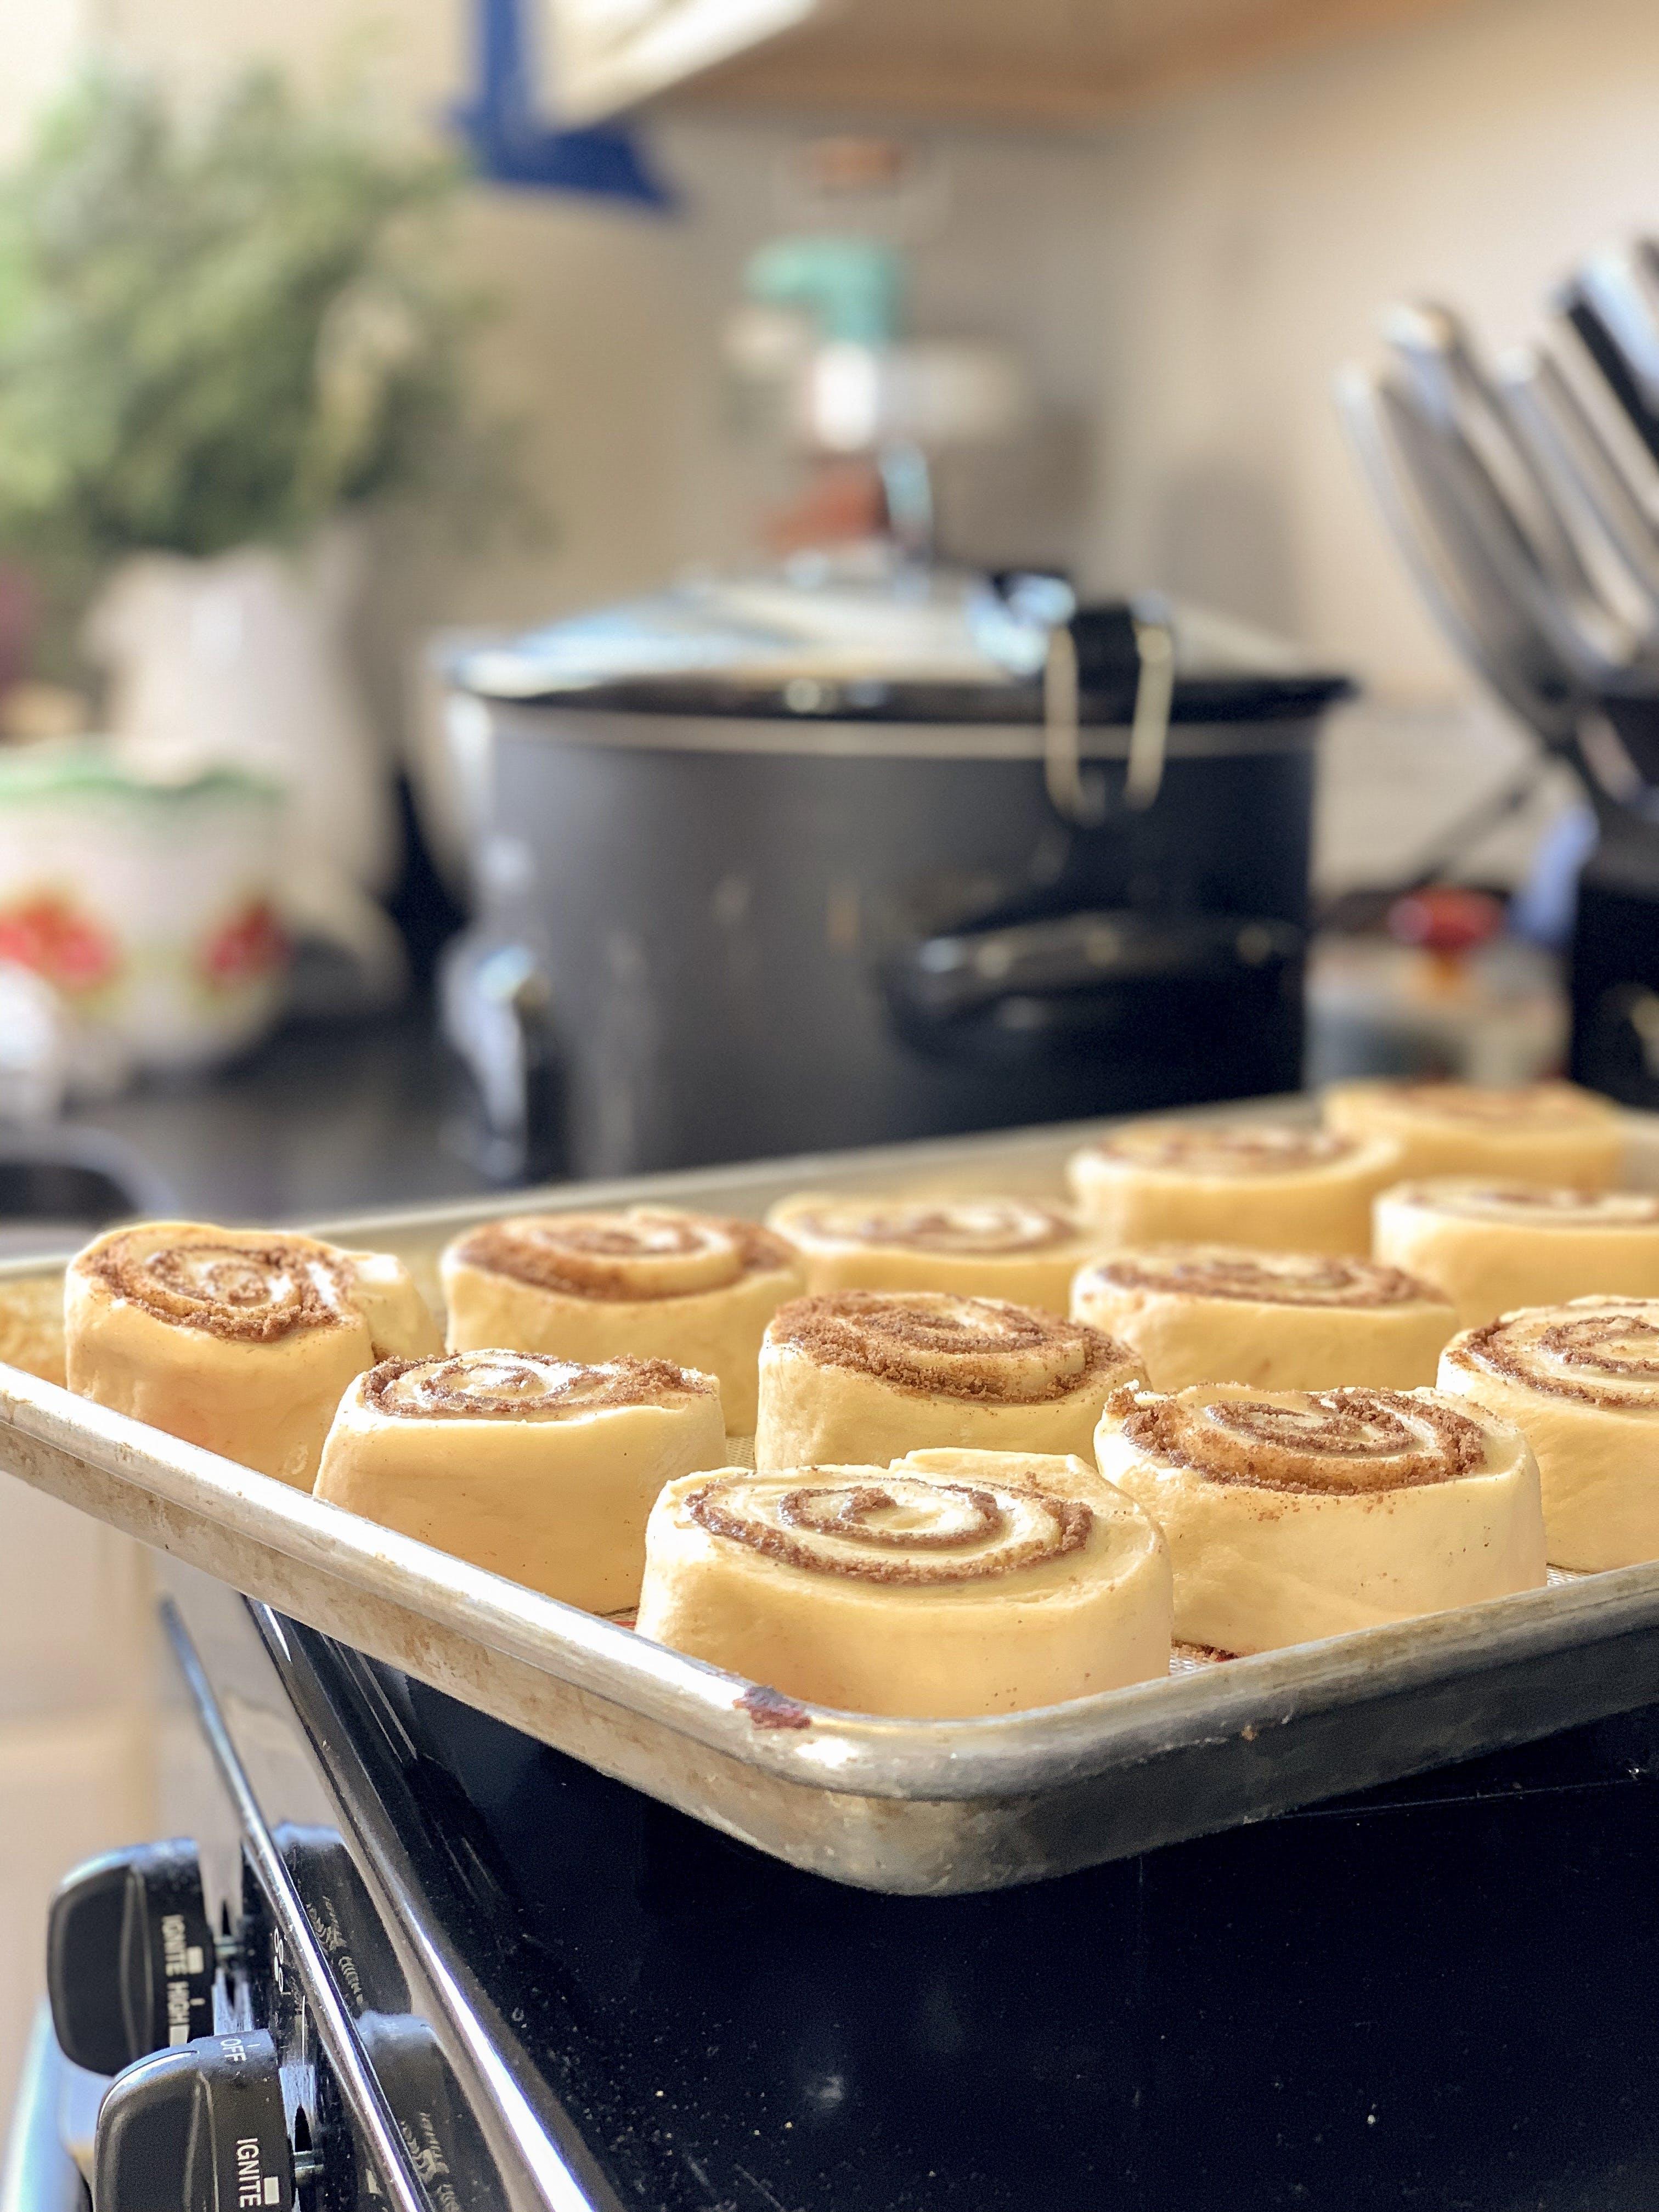 Free stock photo of baked goods, baking, bread, cinnamon